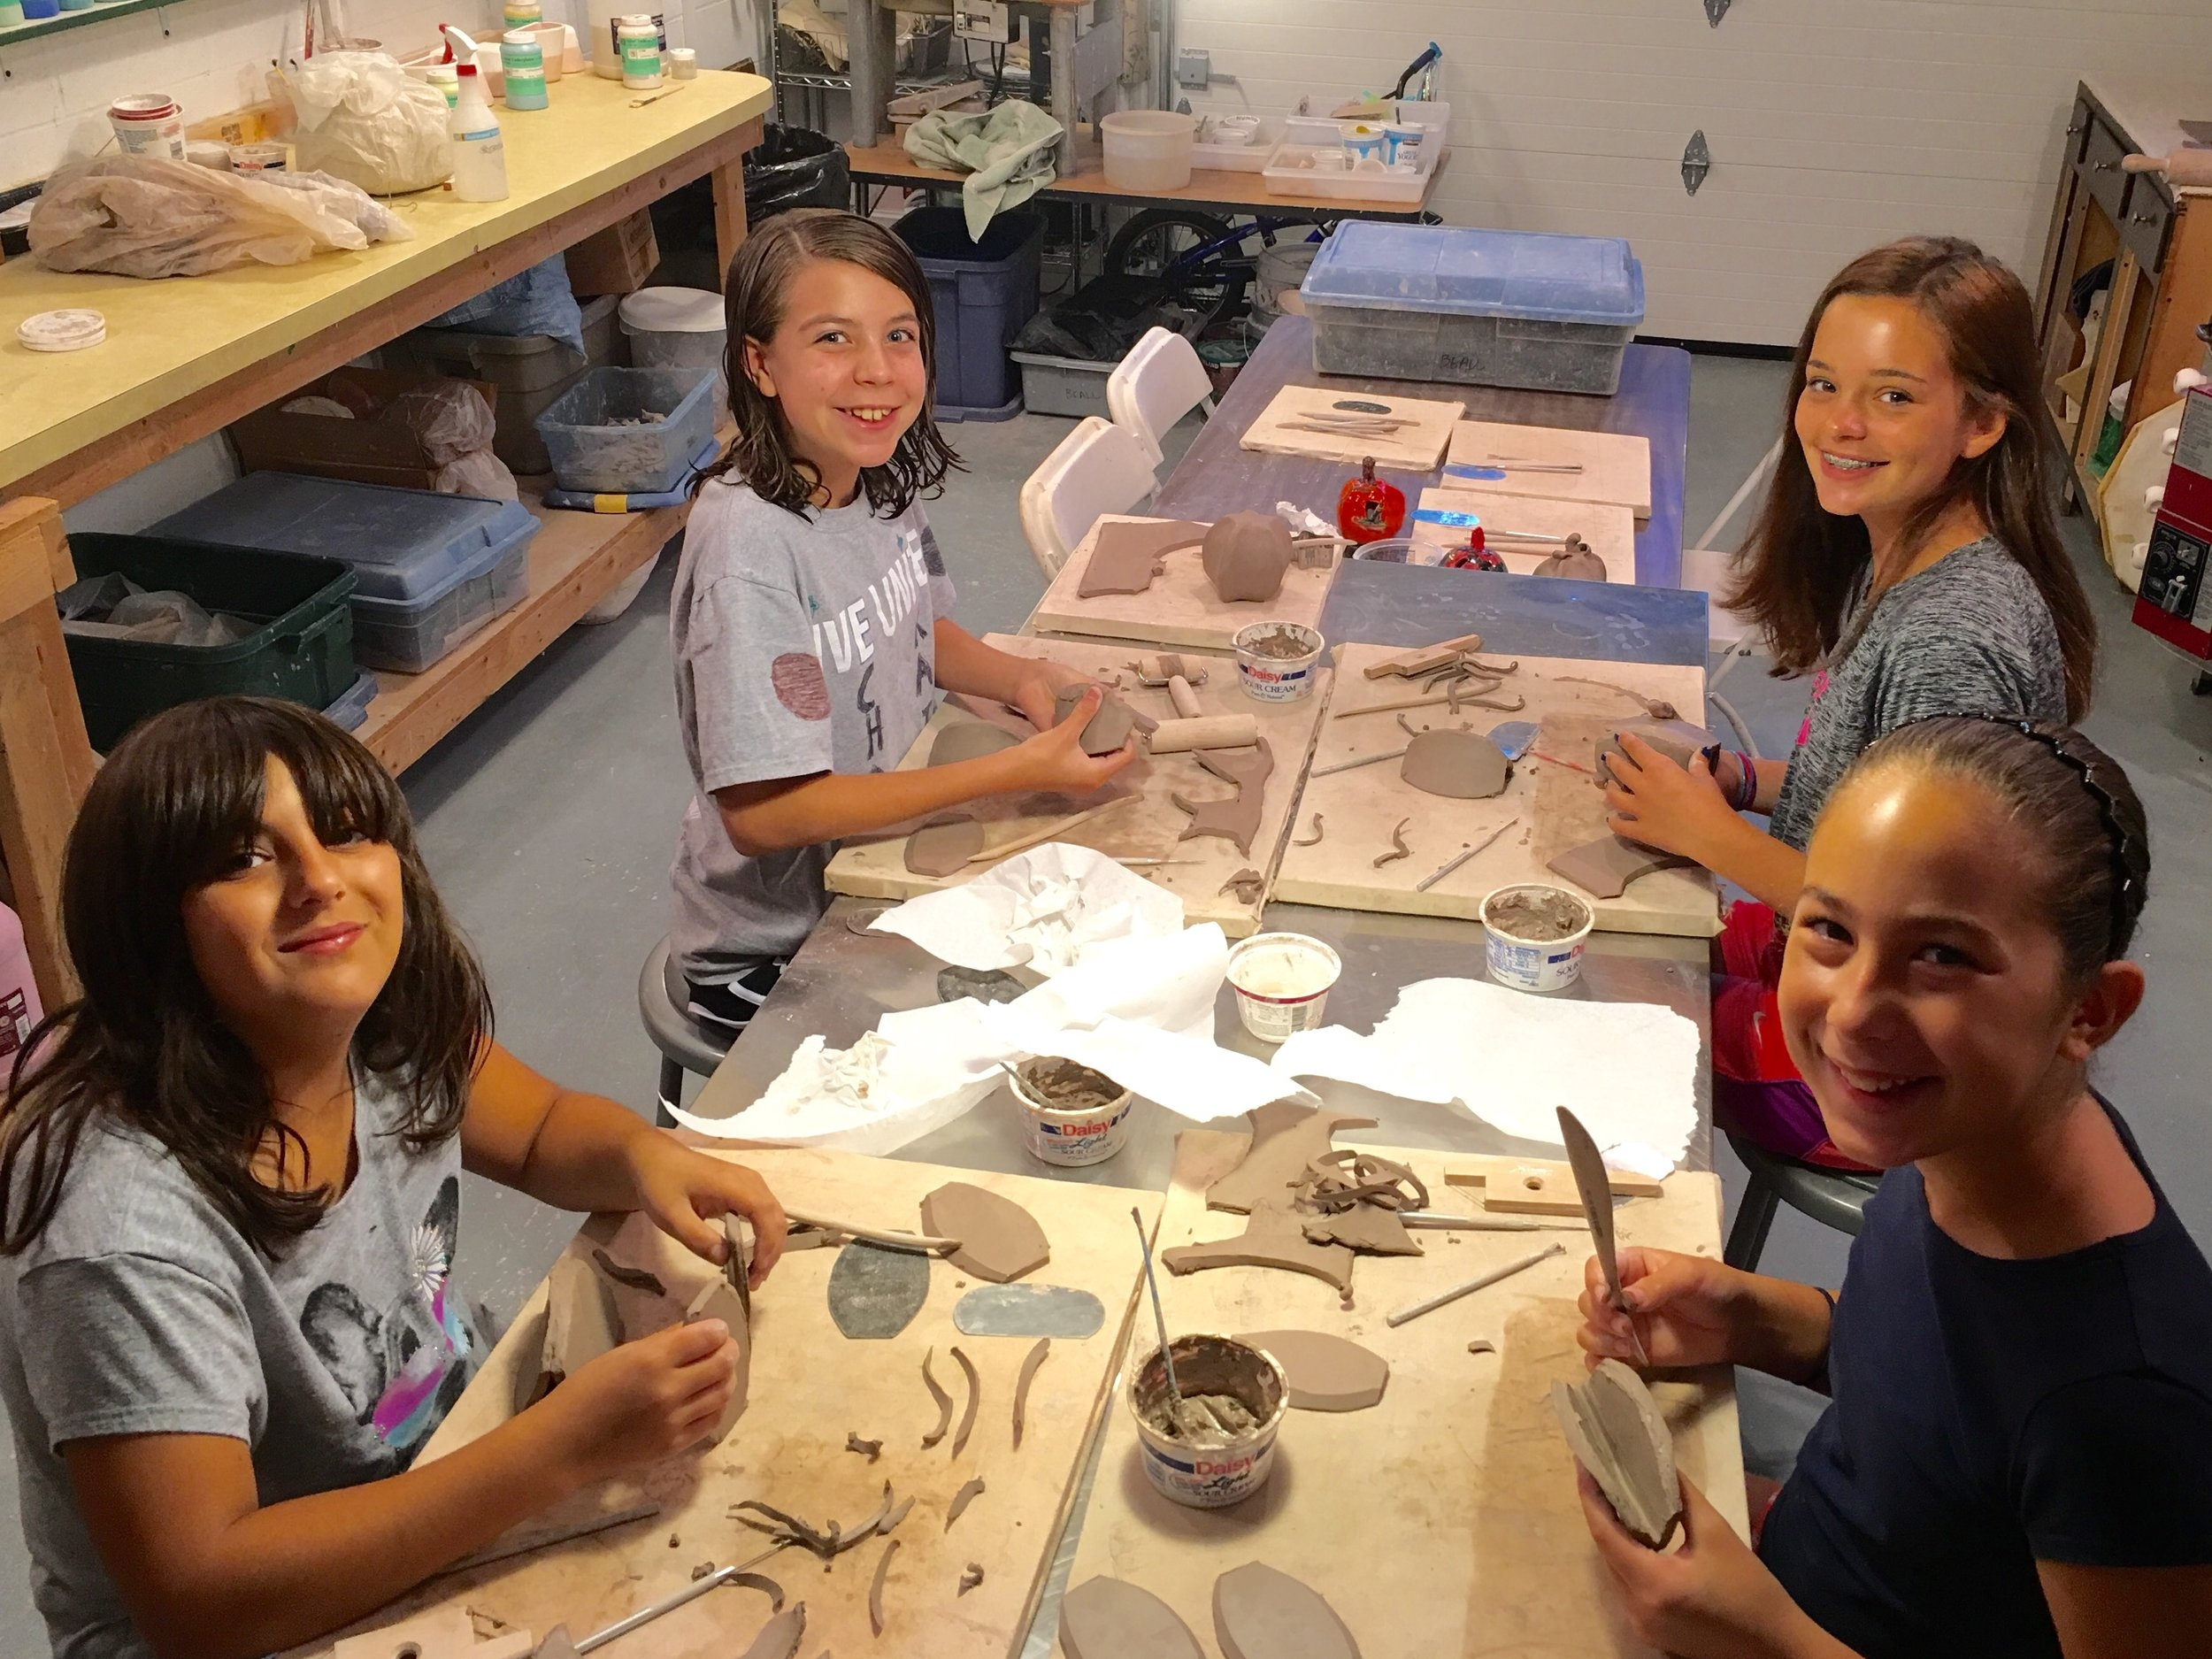 Making clay pumpkins